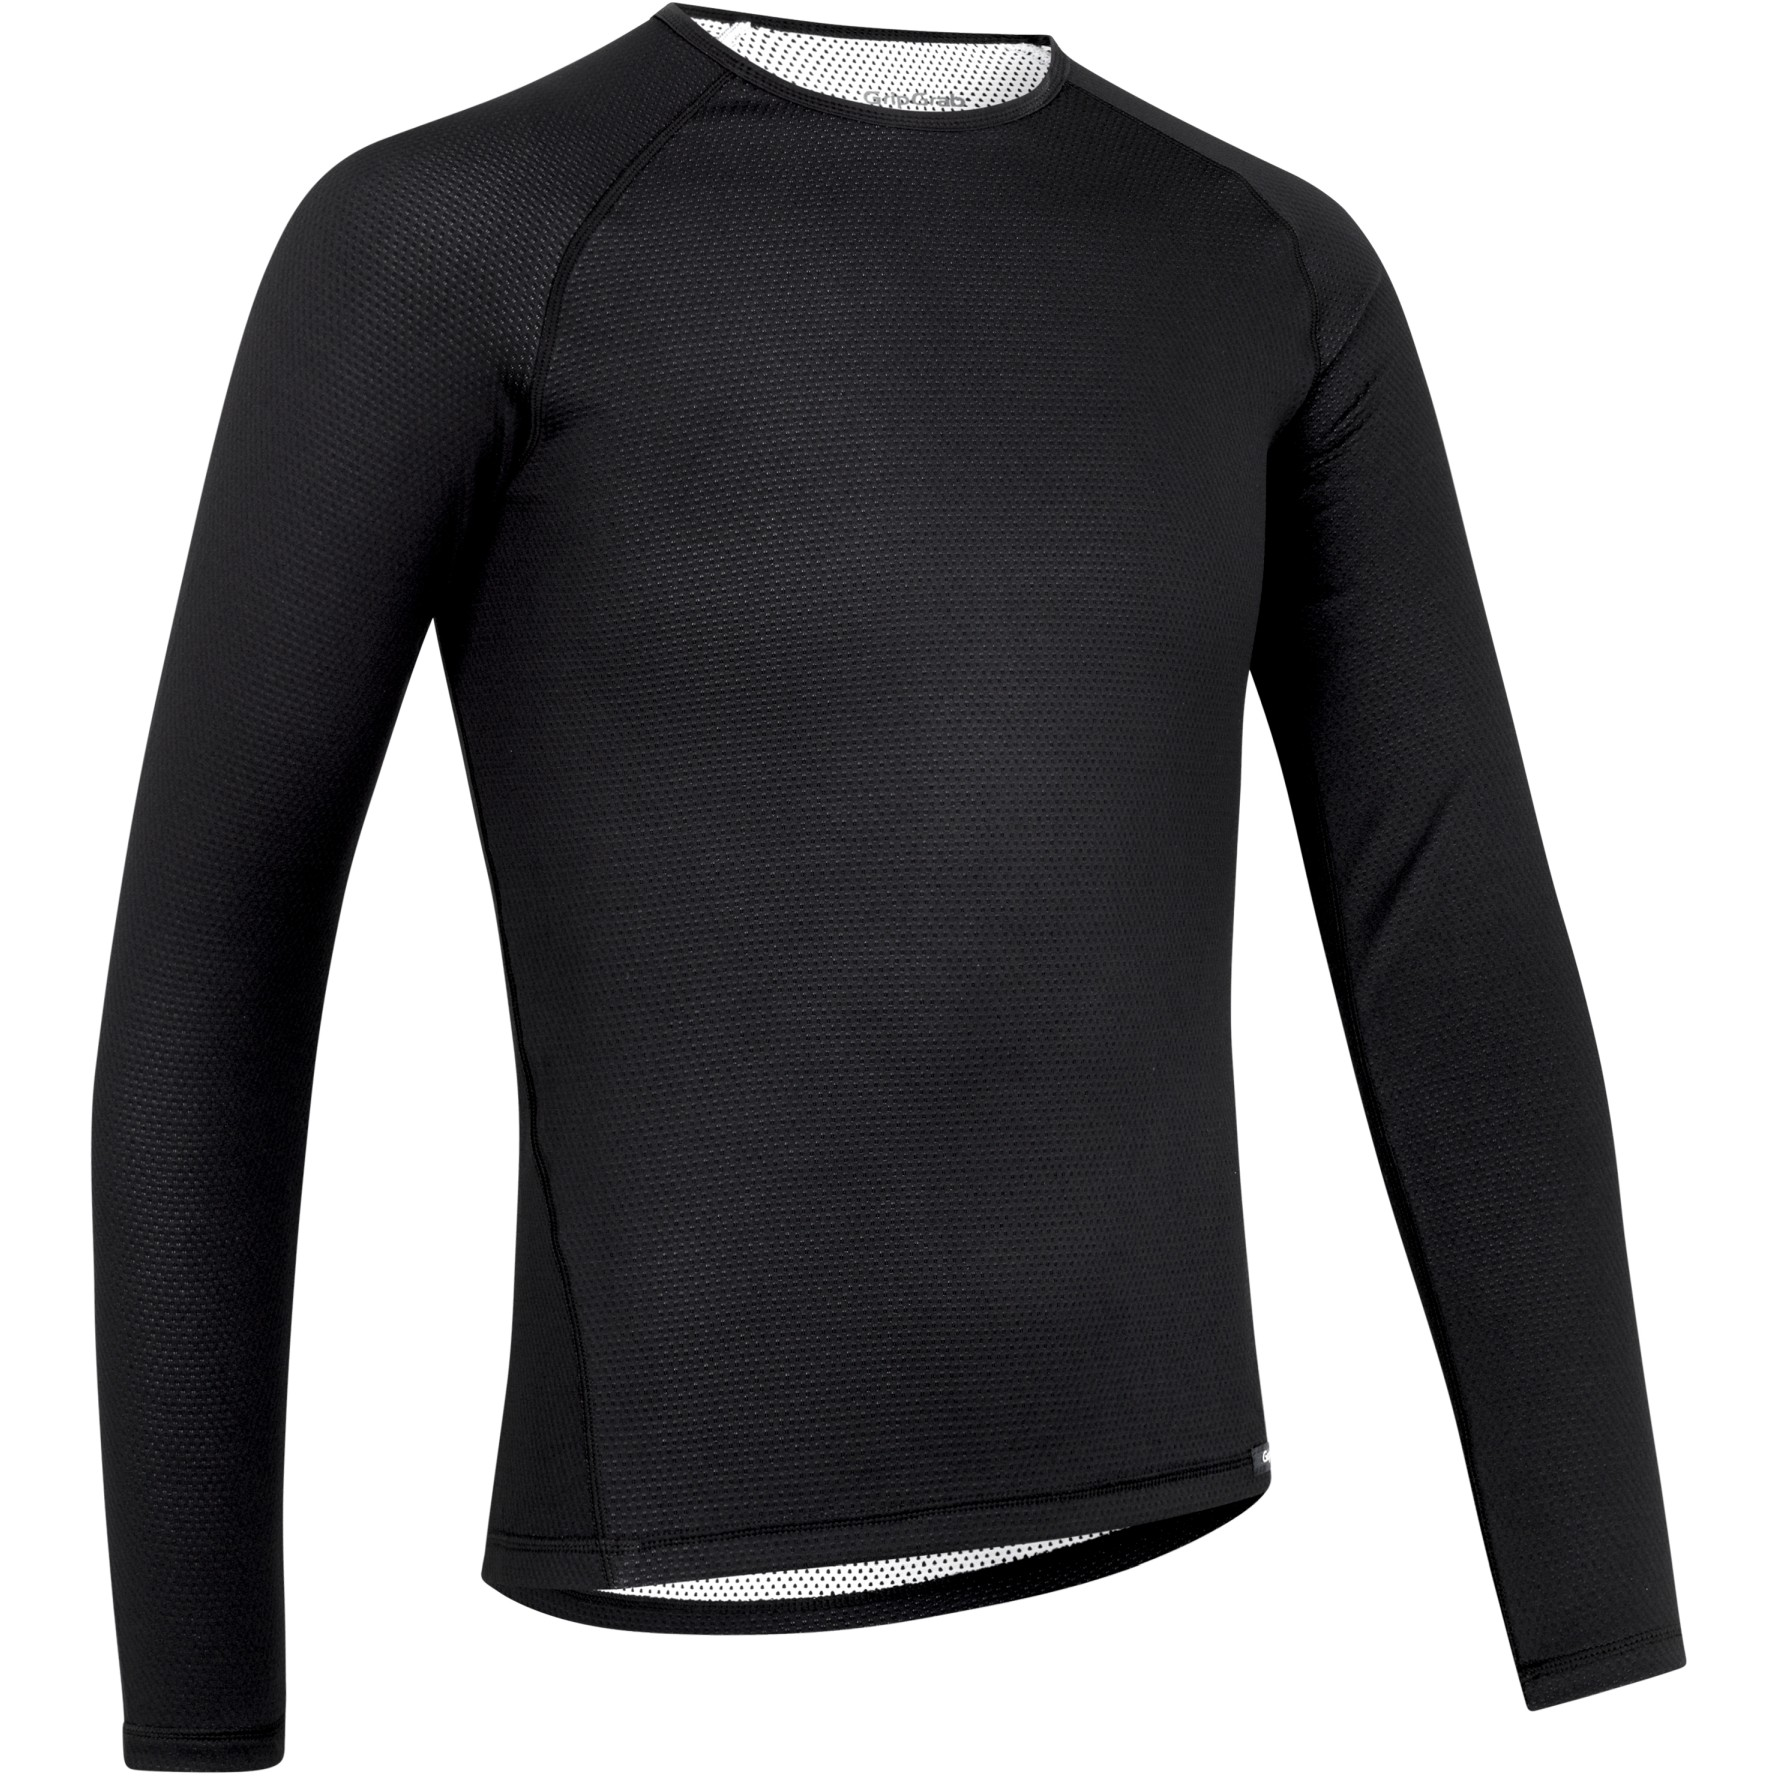 GripGrab Ride Thermal Long Sleeve Base Layer - Black